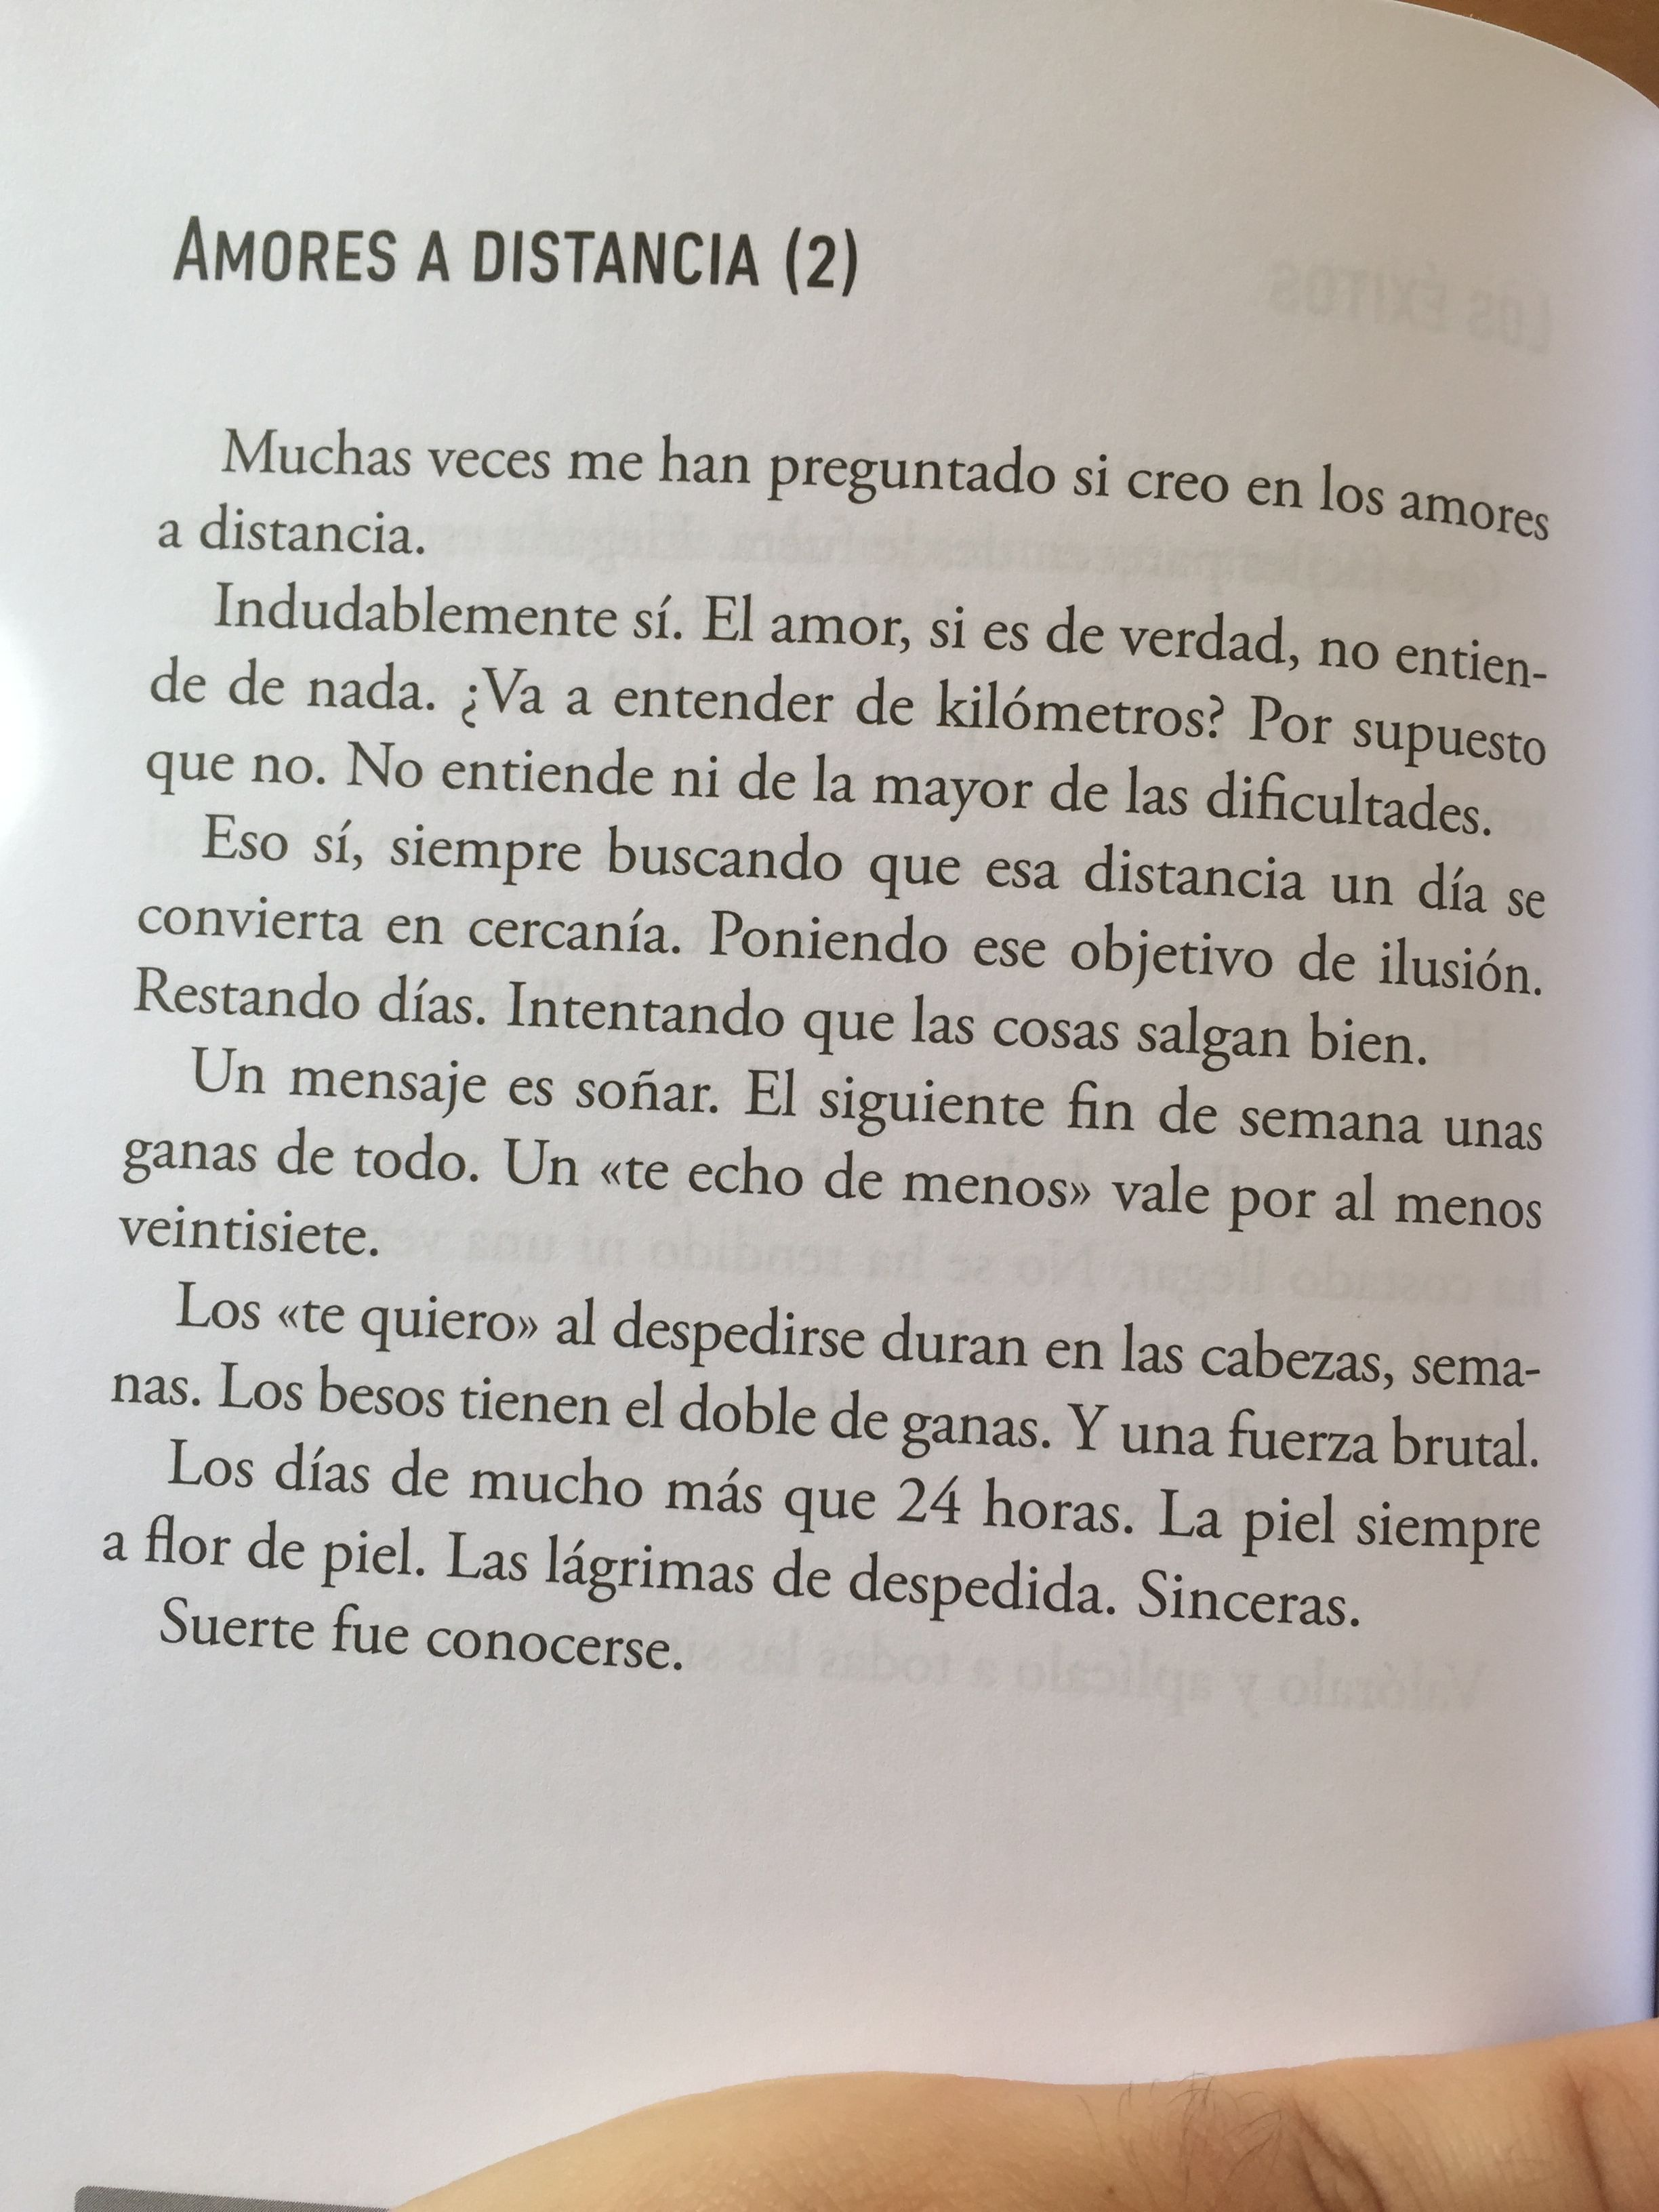 Amores a distancia 2 Amor FrasesFrases